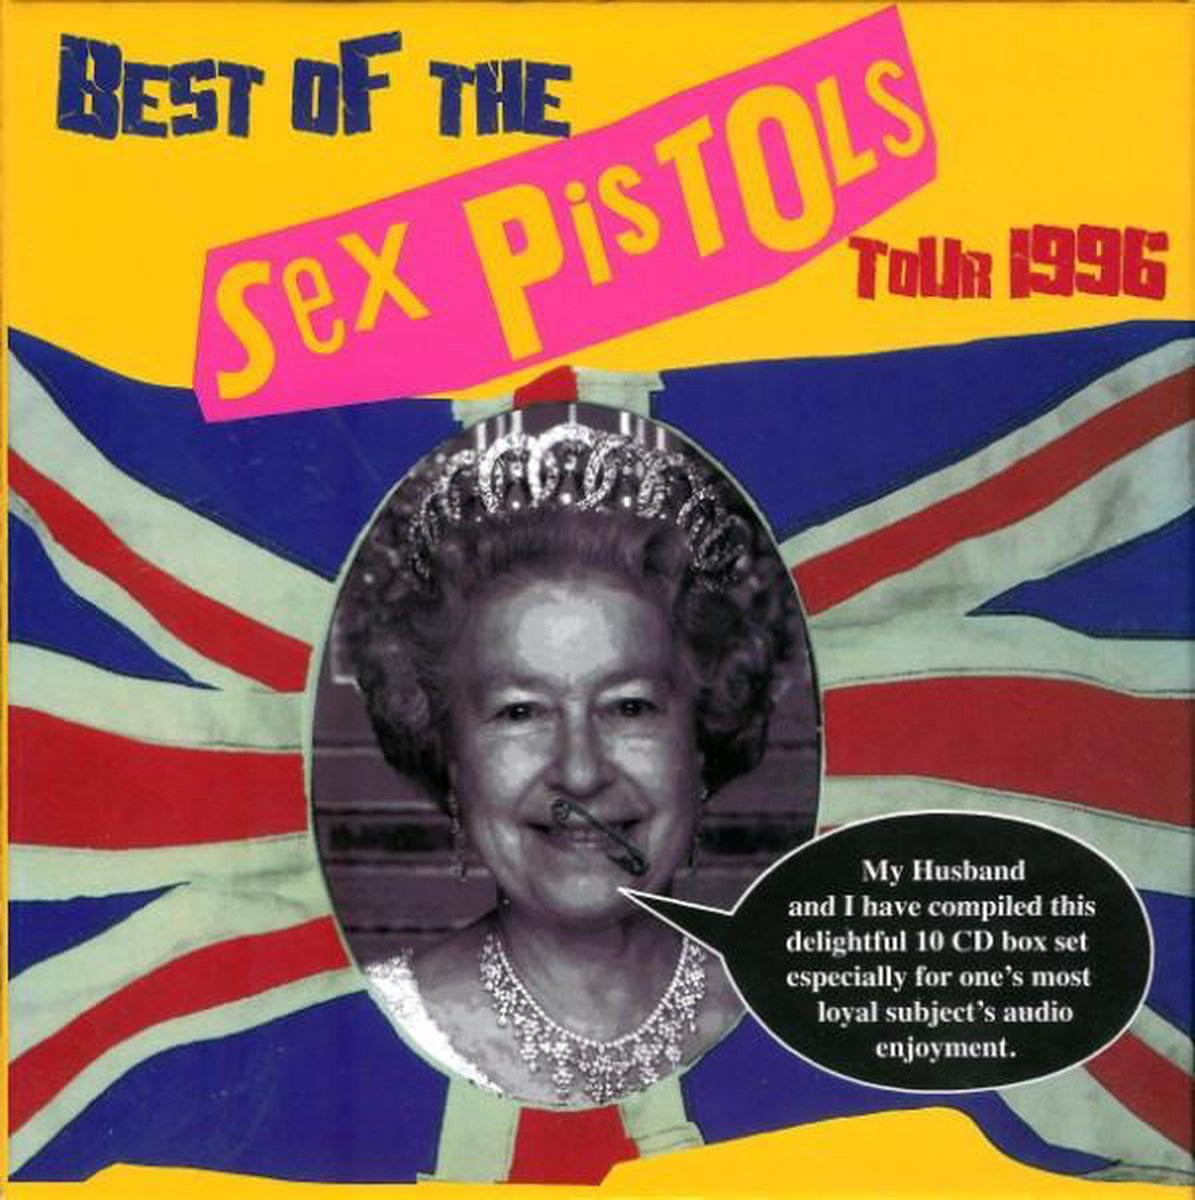 Best Of The Sex Pistols  Tour 1996